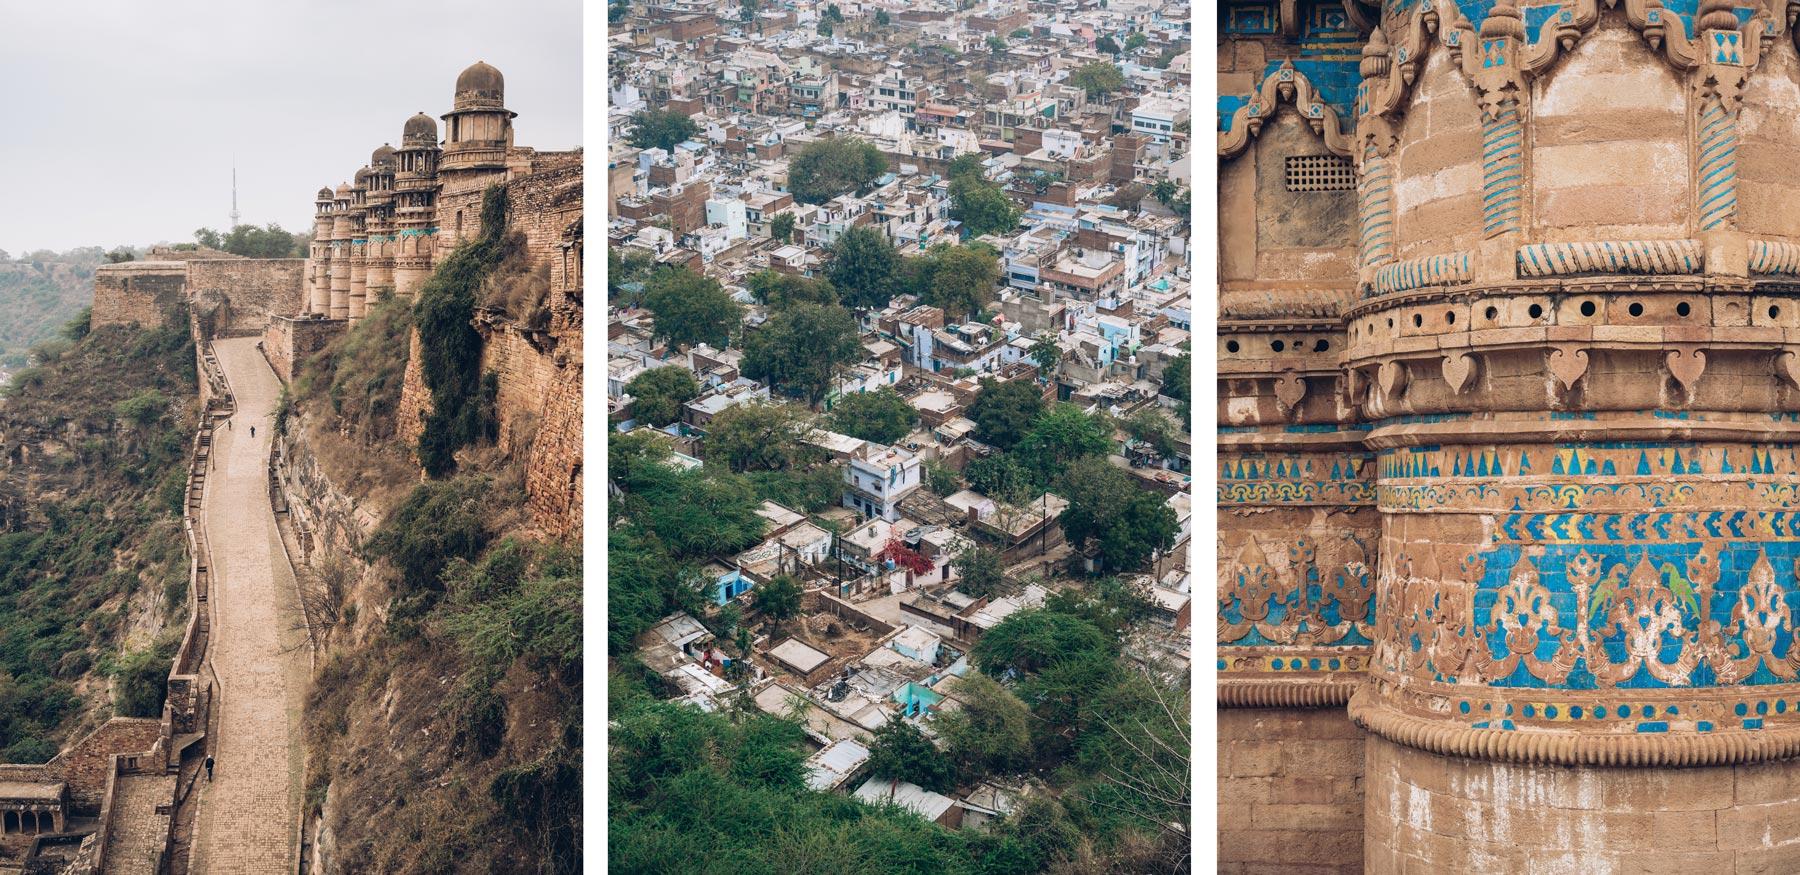 Gwalior, Blog Voyage